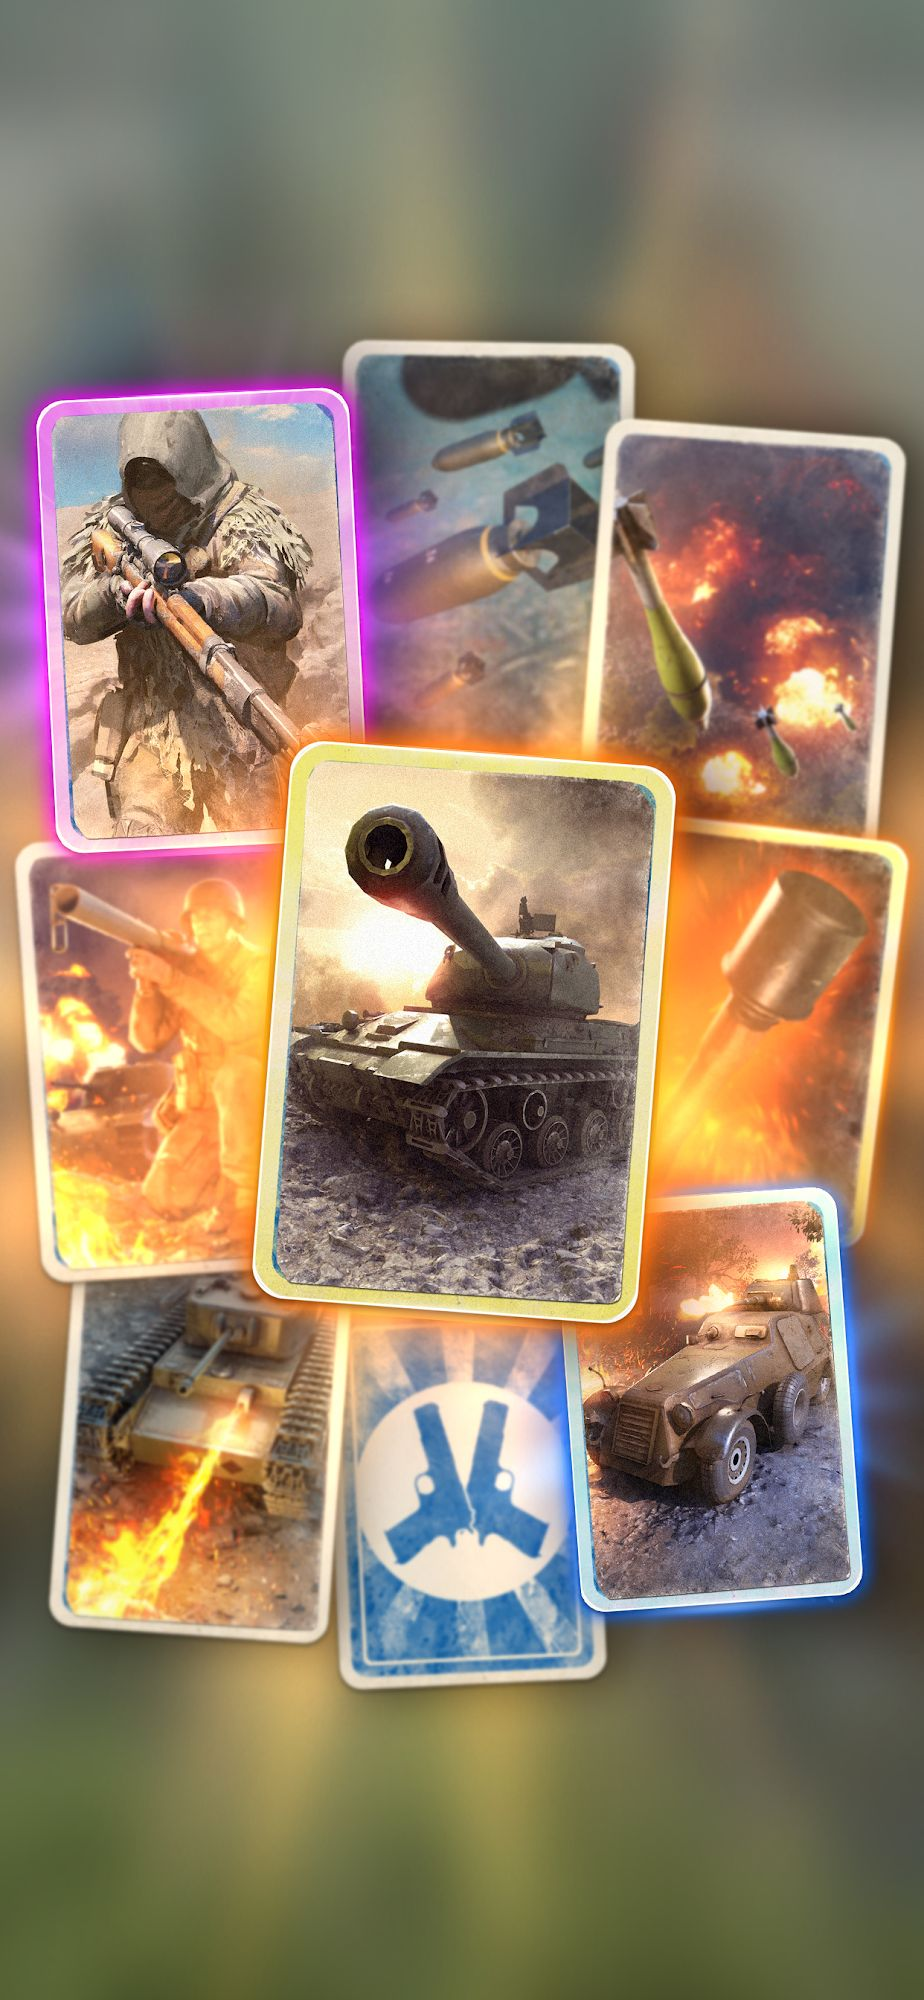 Heroes of War: WW2 Idle RPG captura de tela 1